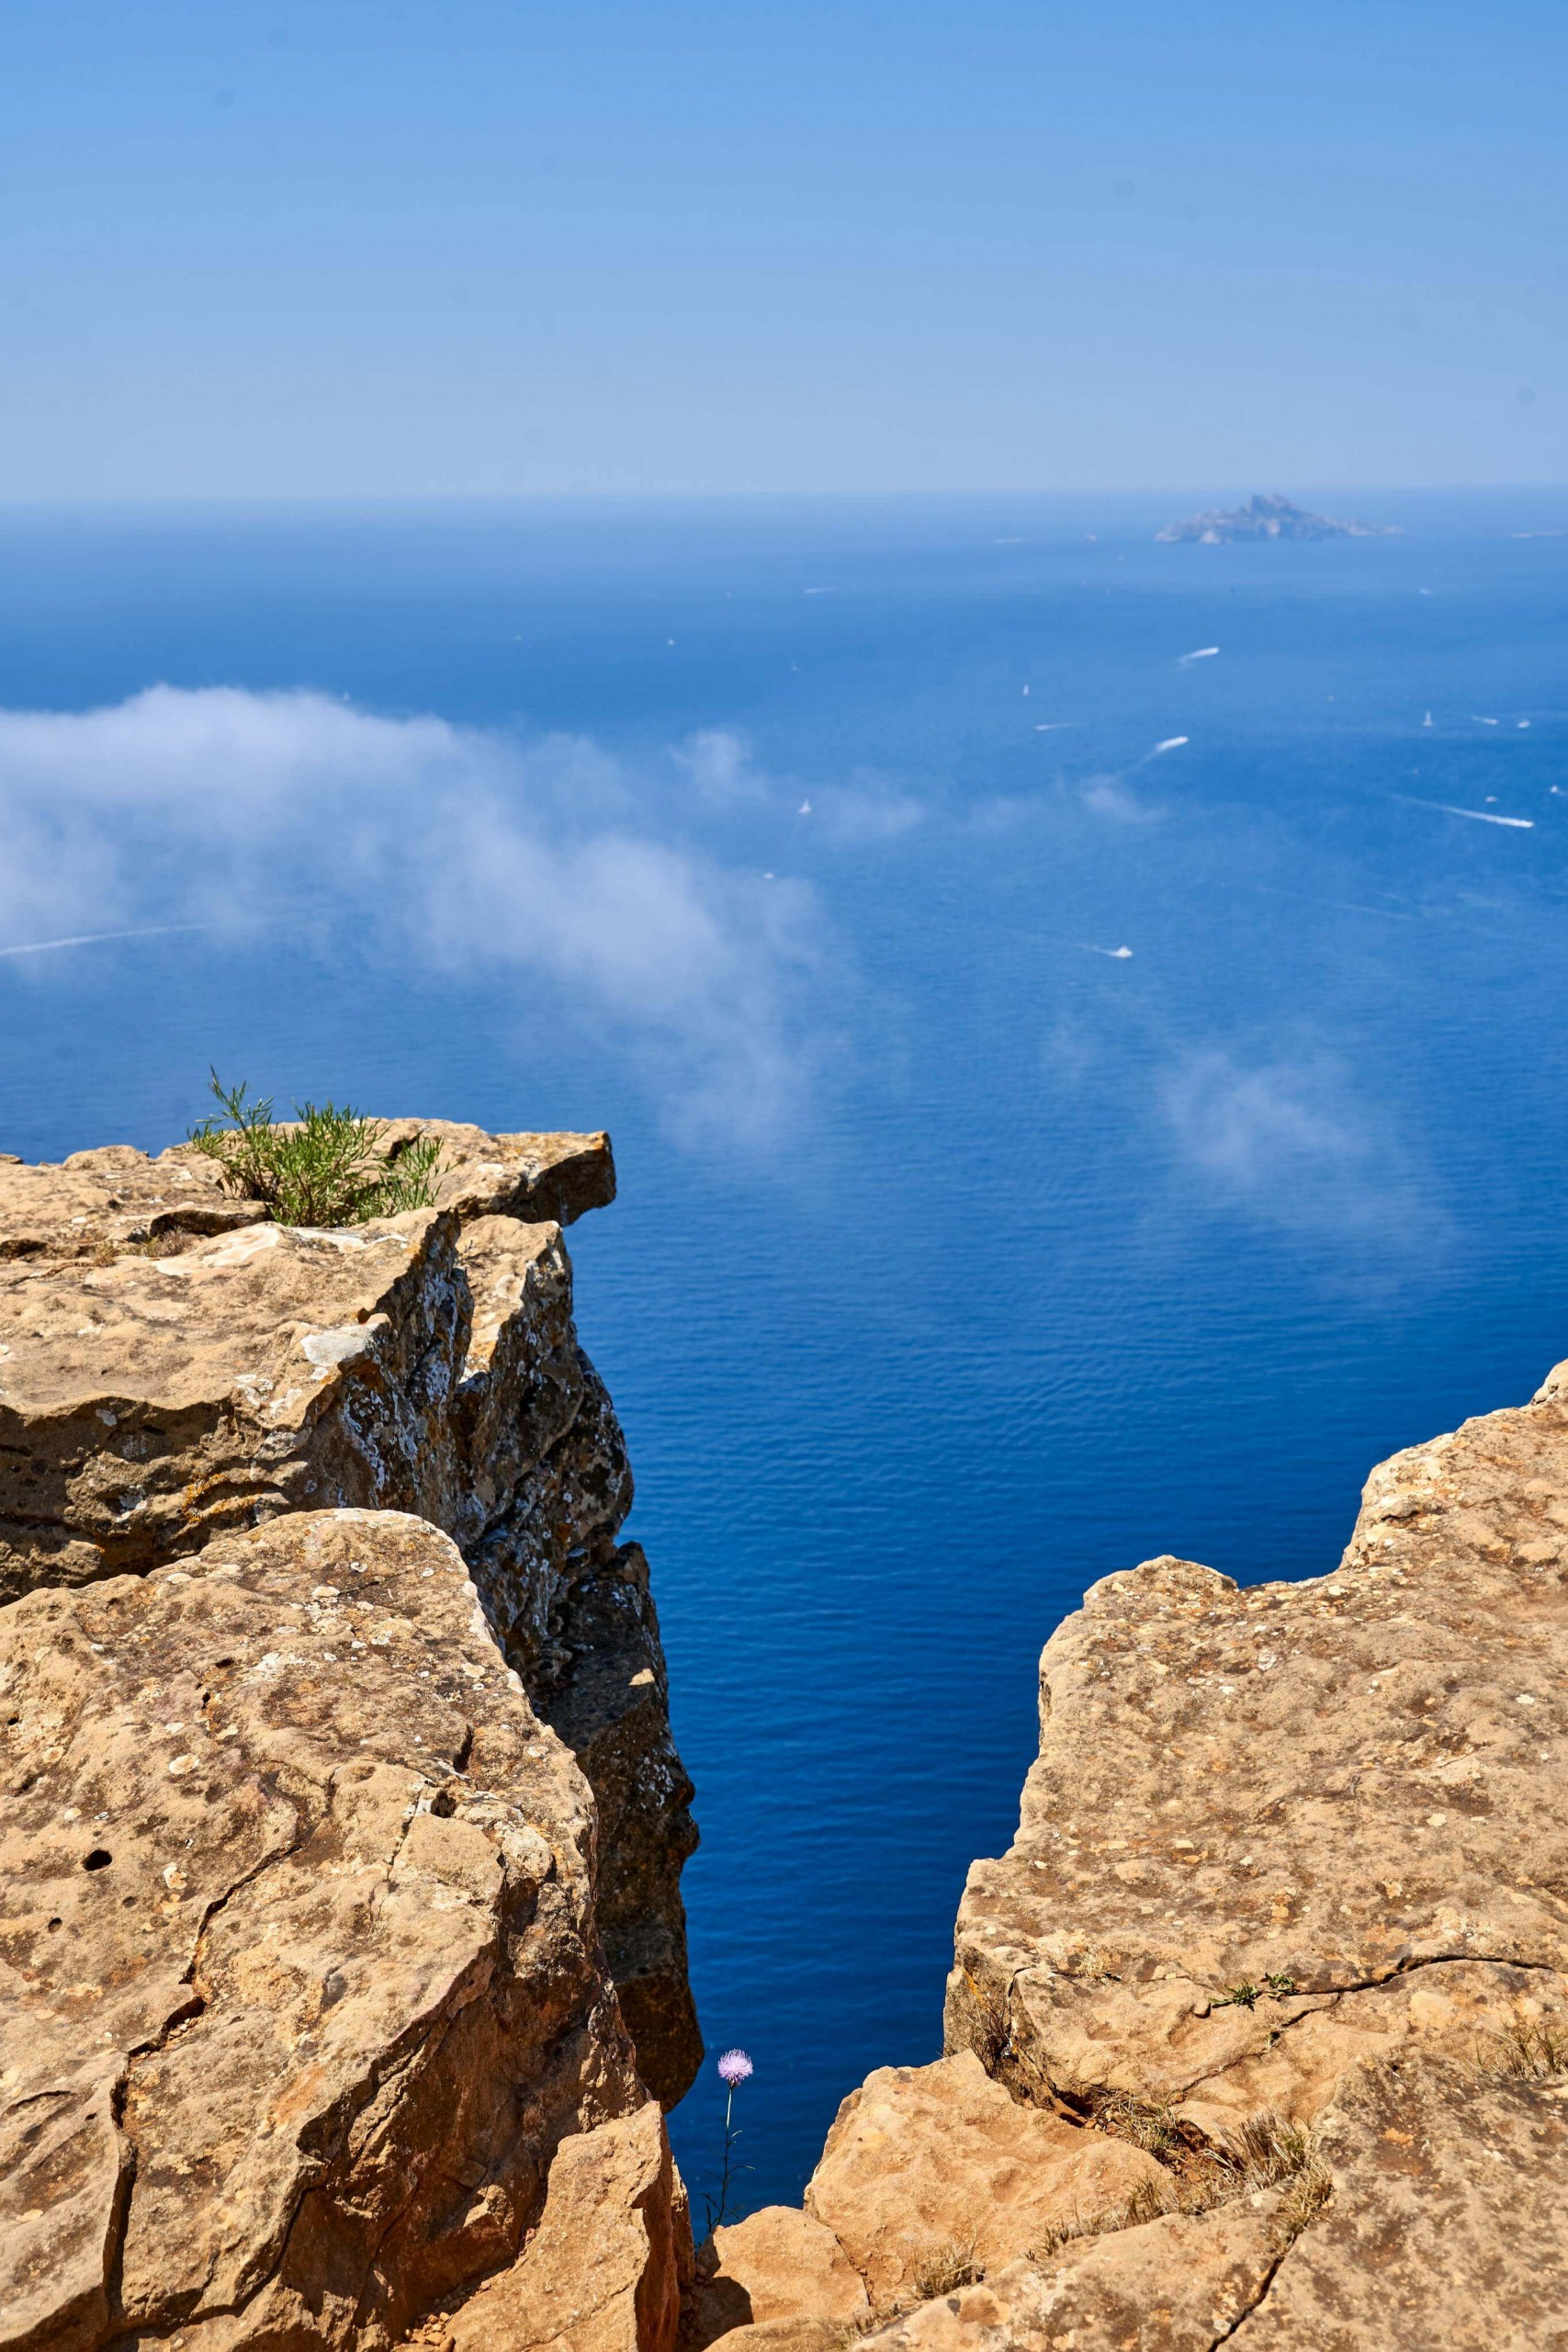 Route des Cretes; Coastal Trails on French Riviera